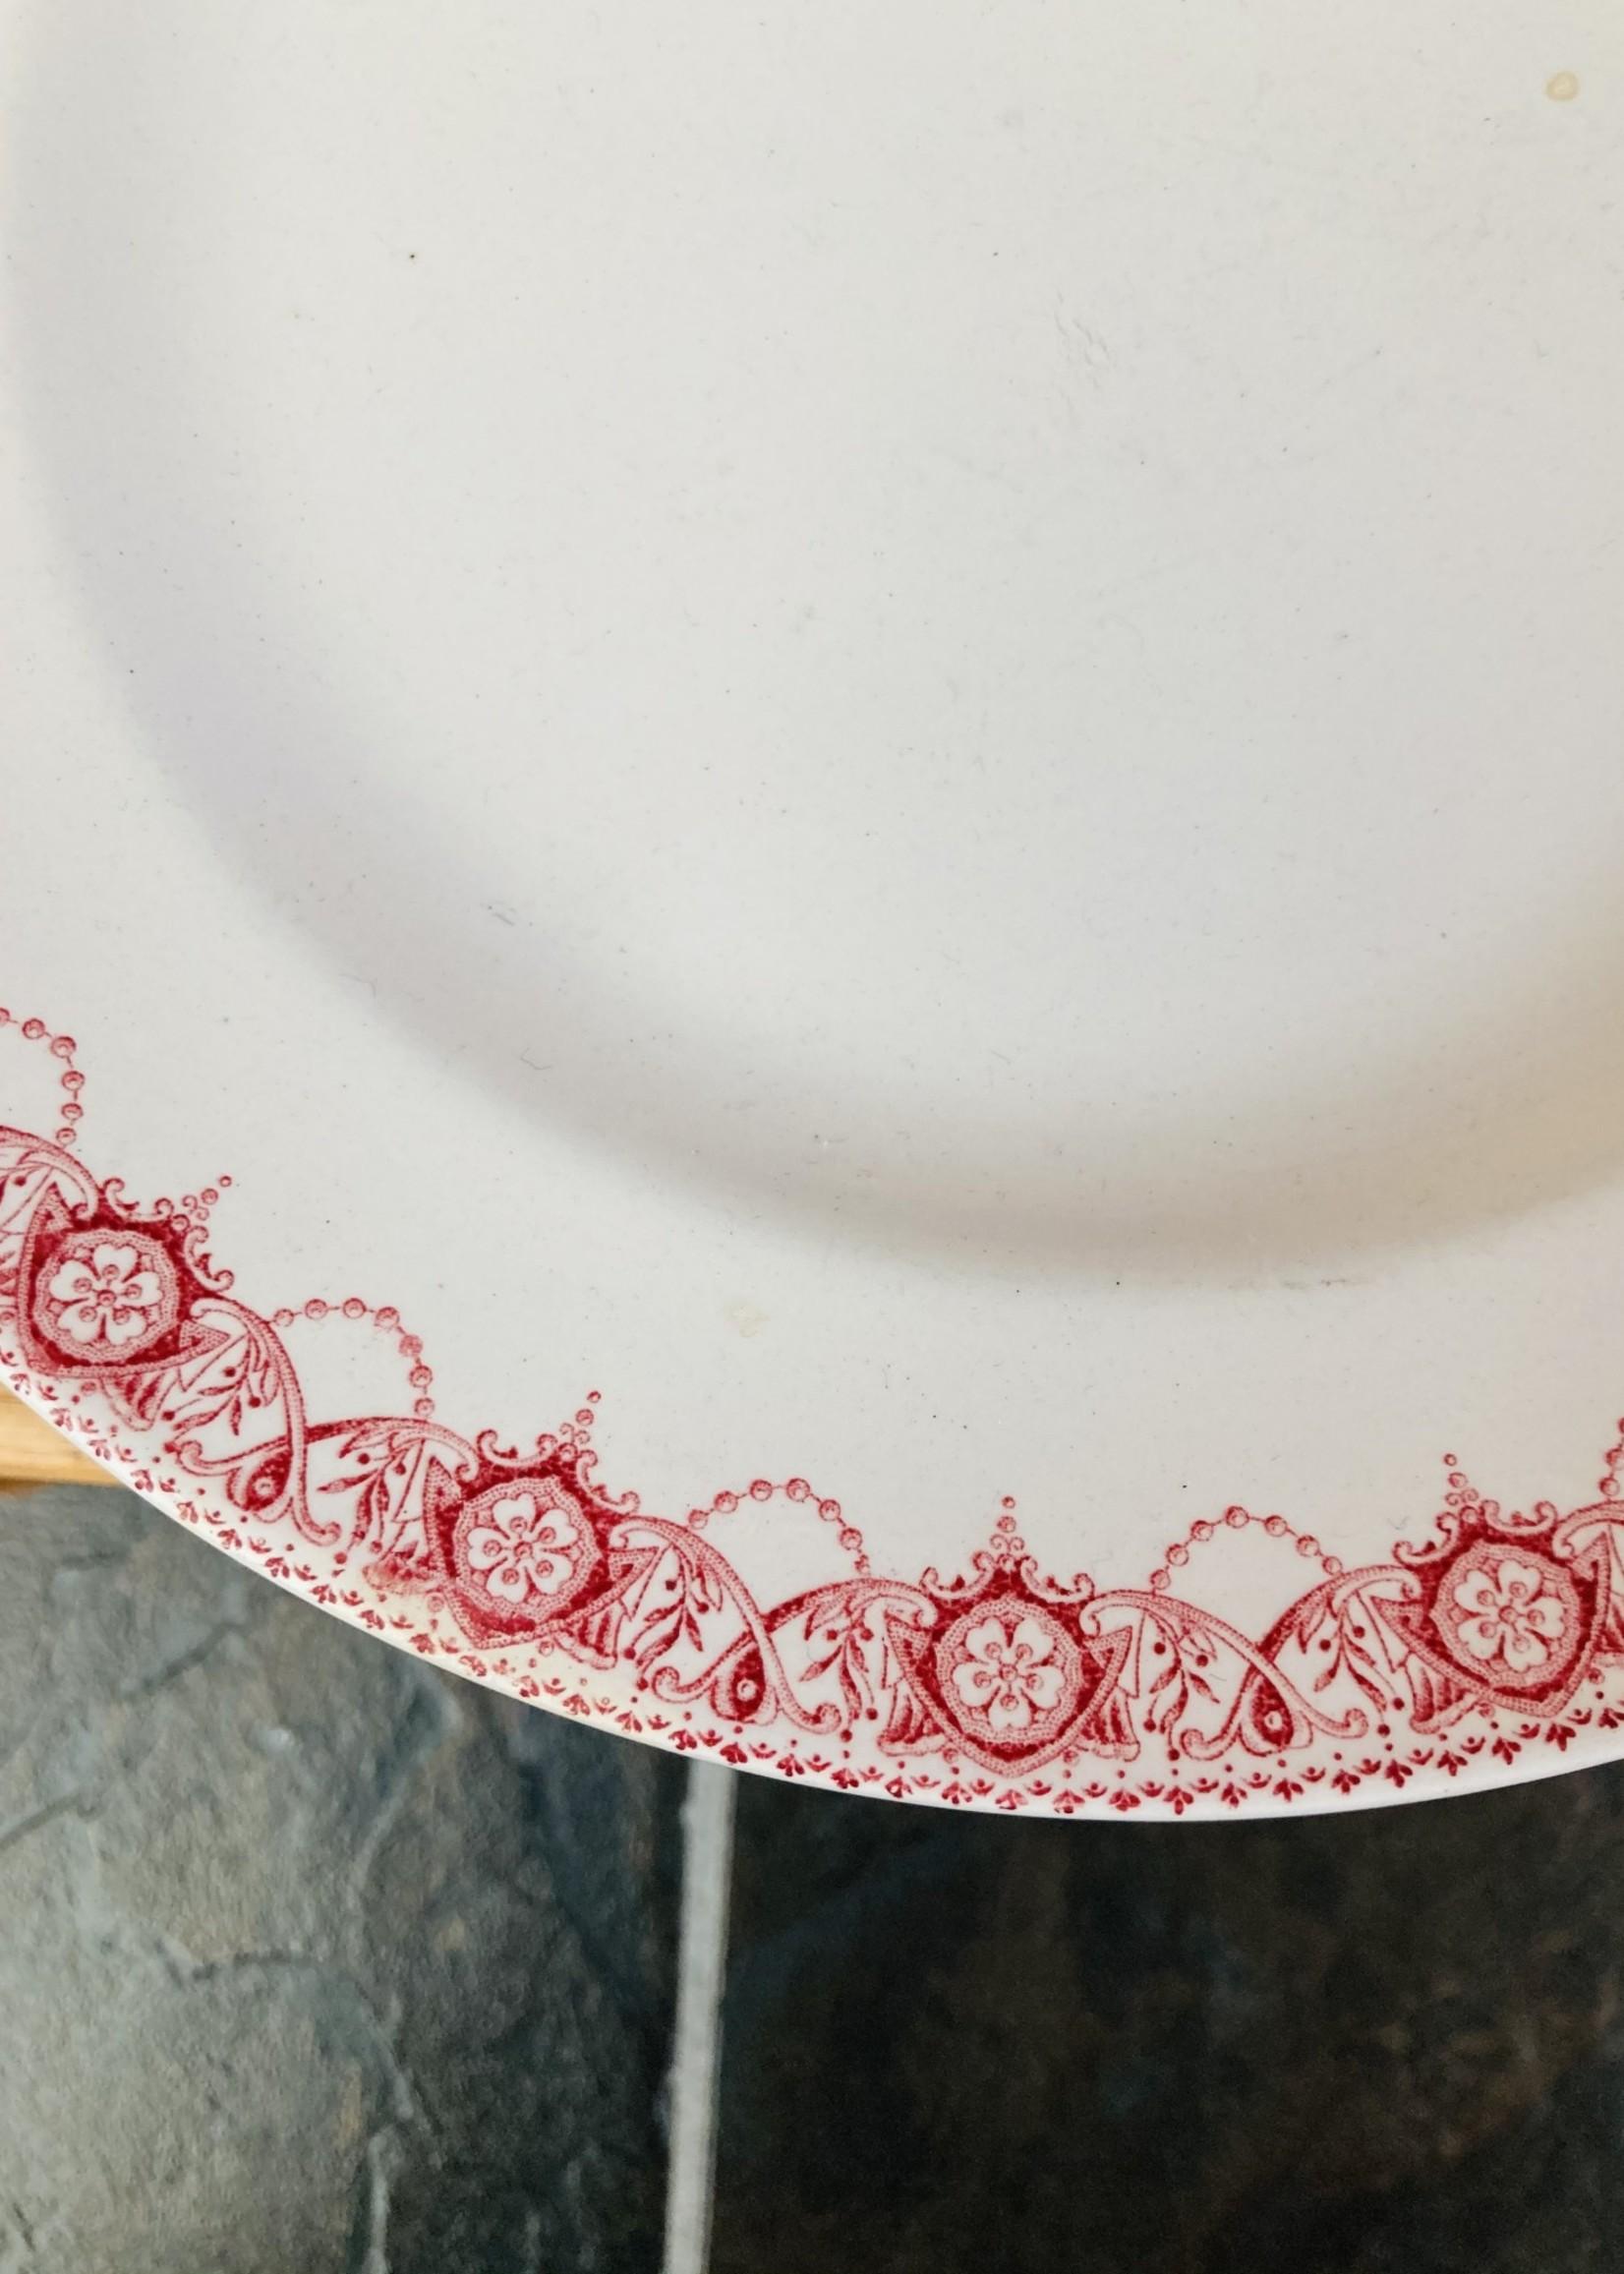 Dinner plate Ramona by Boch, pink decor